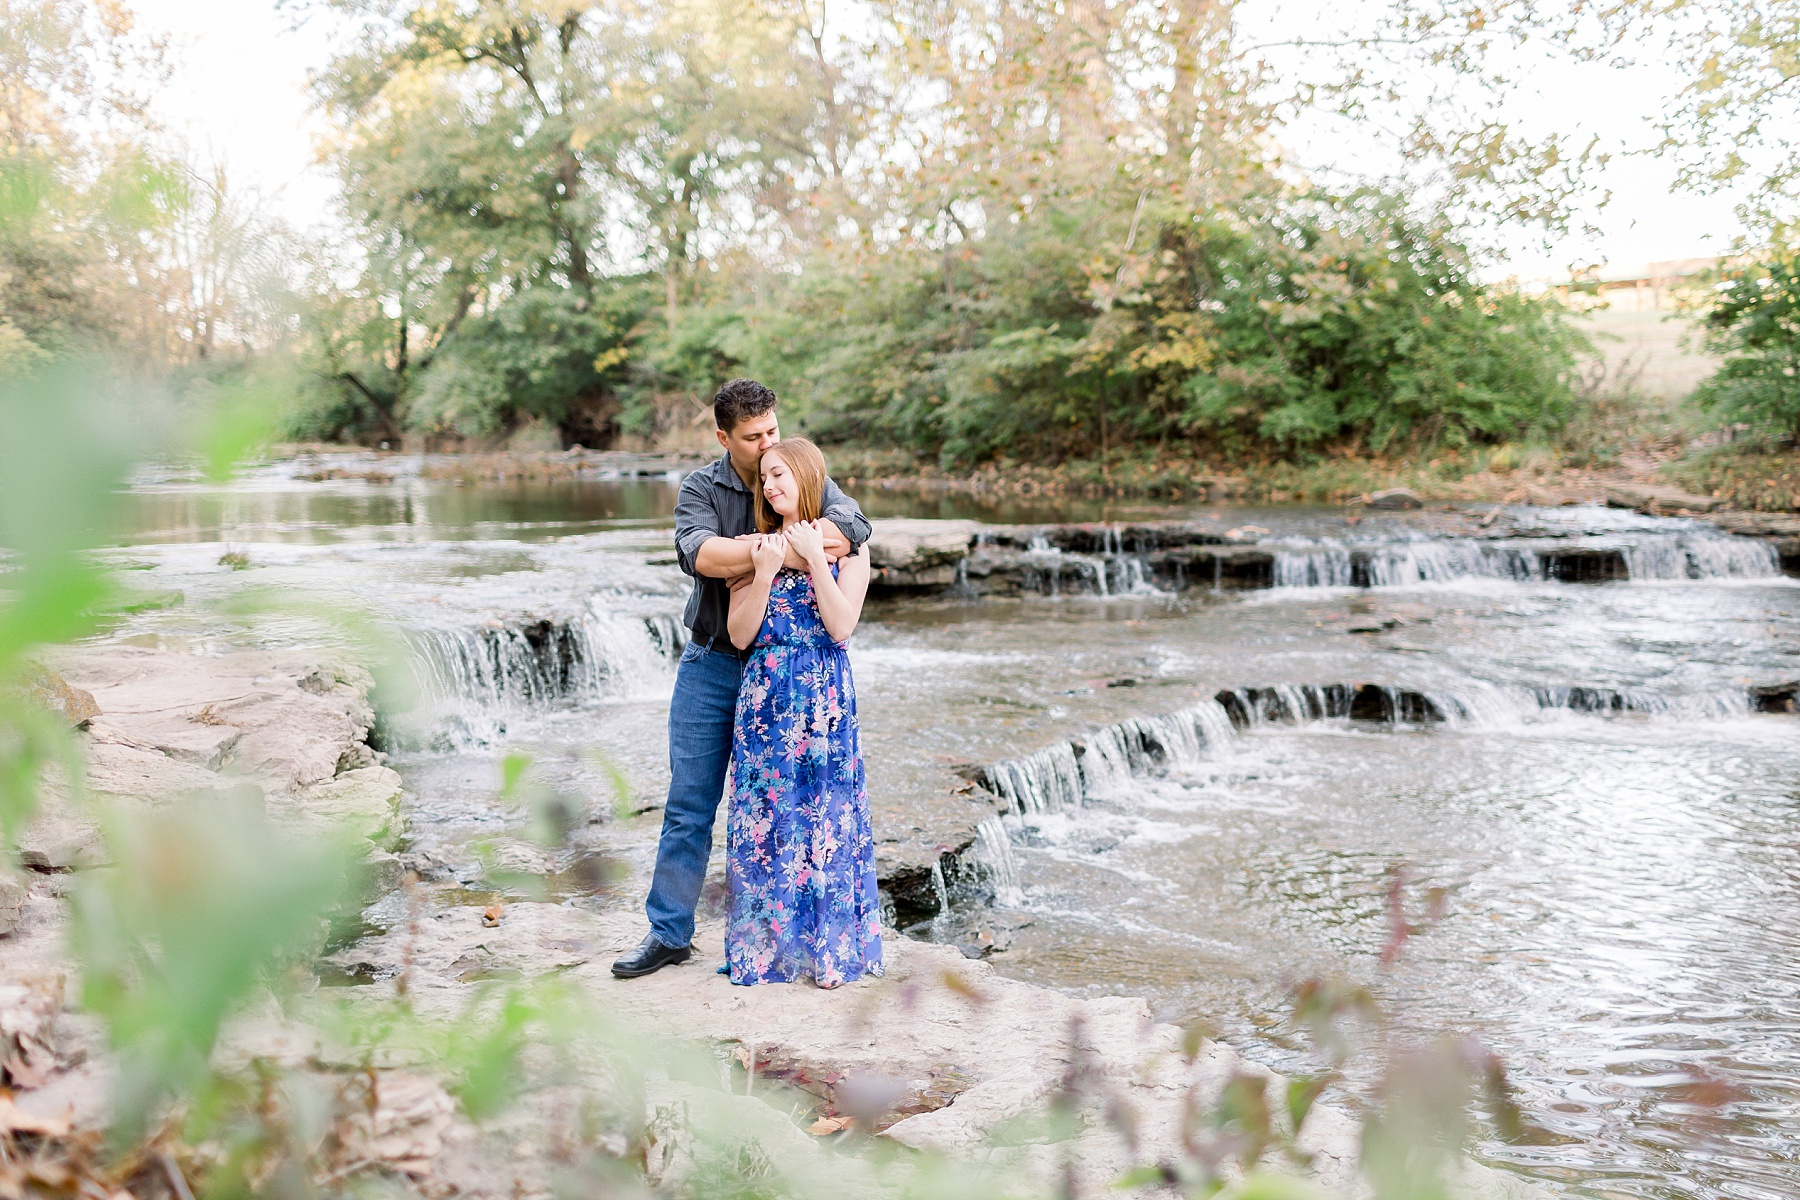 adventurous-authentic-wedding-engagement-photography-kansas-city-elizabeth-ladean-photo_5394.jpg